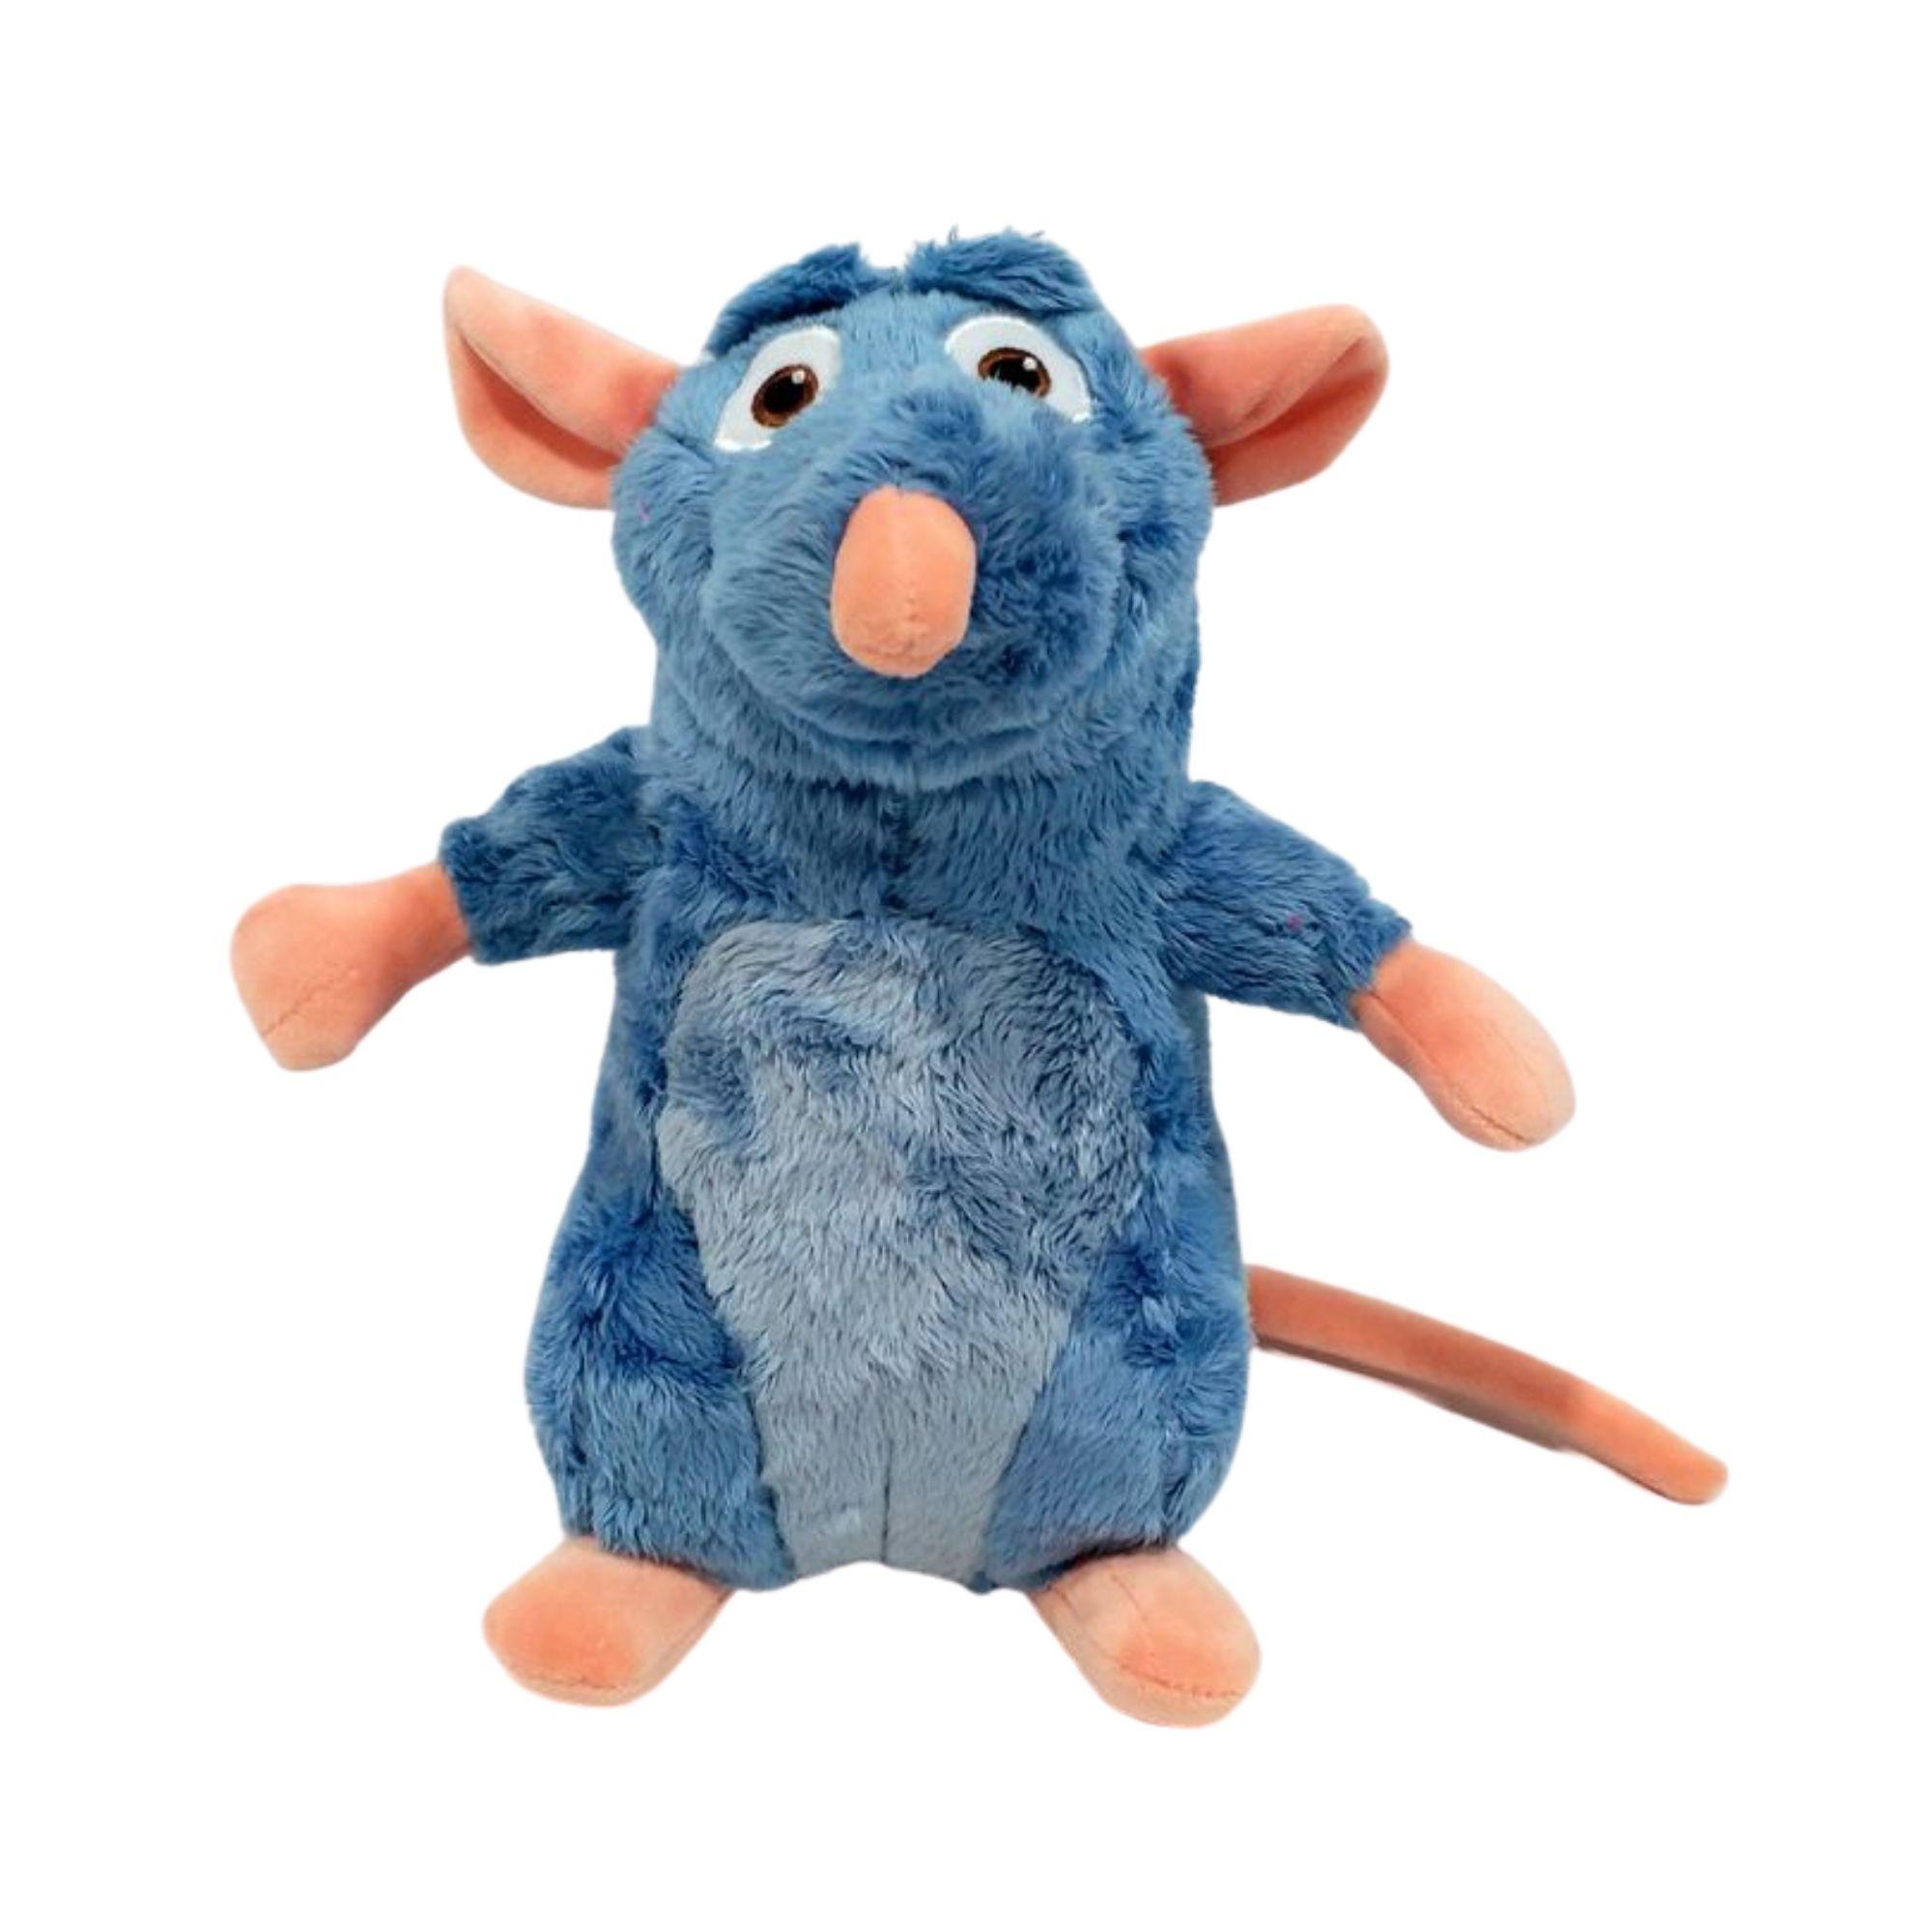 Pelúcia Remy Ratatouille Authentic Disney Parks  - Game Land Brinquedos